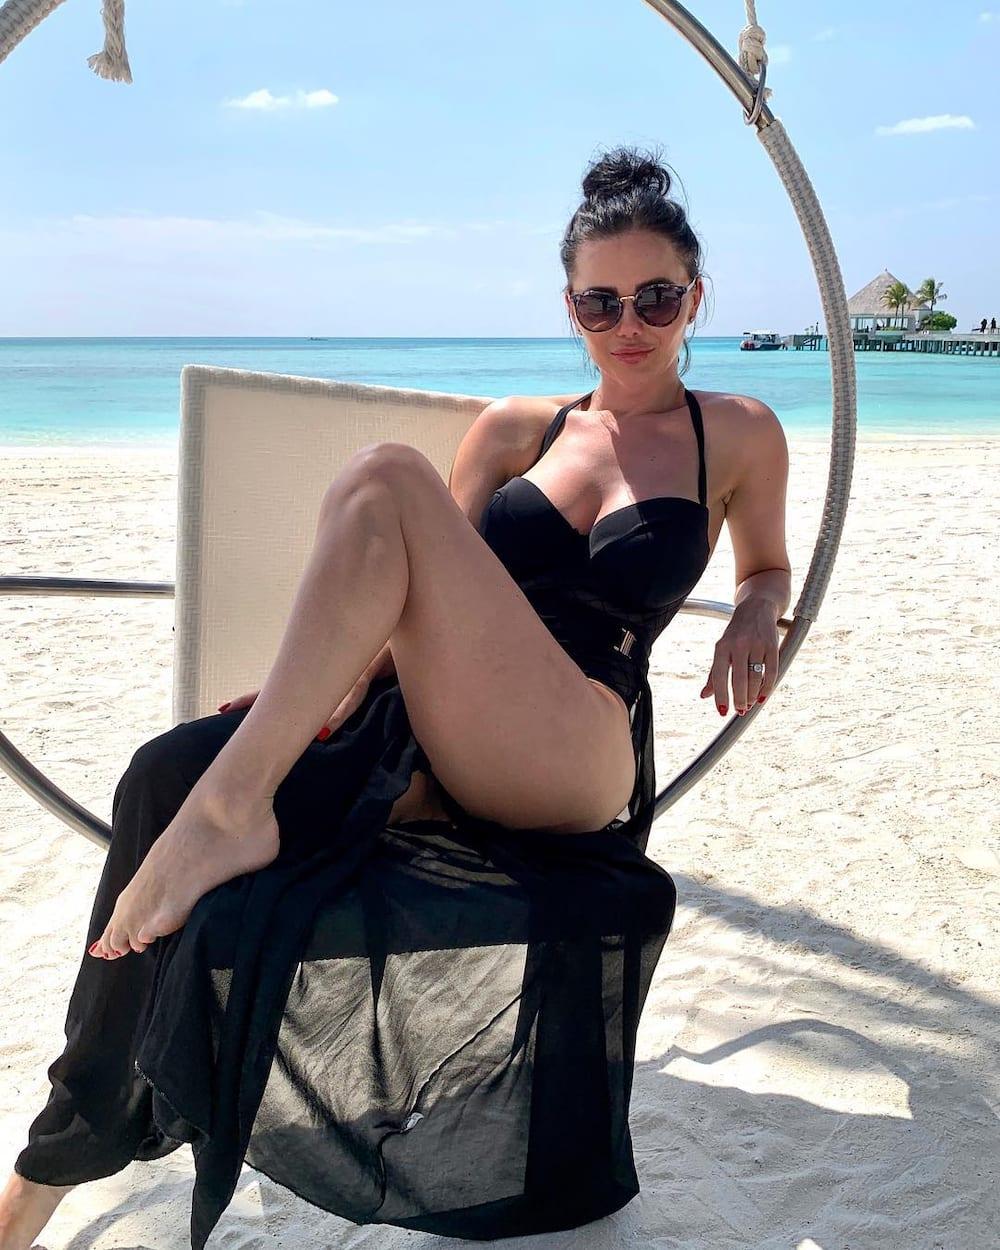 Emma Glover: 10 facts about the Instagram model ▷ Tuko co ke